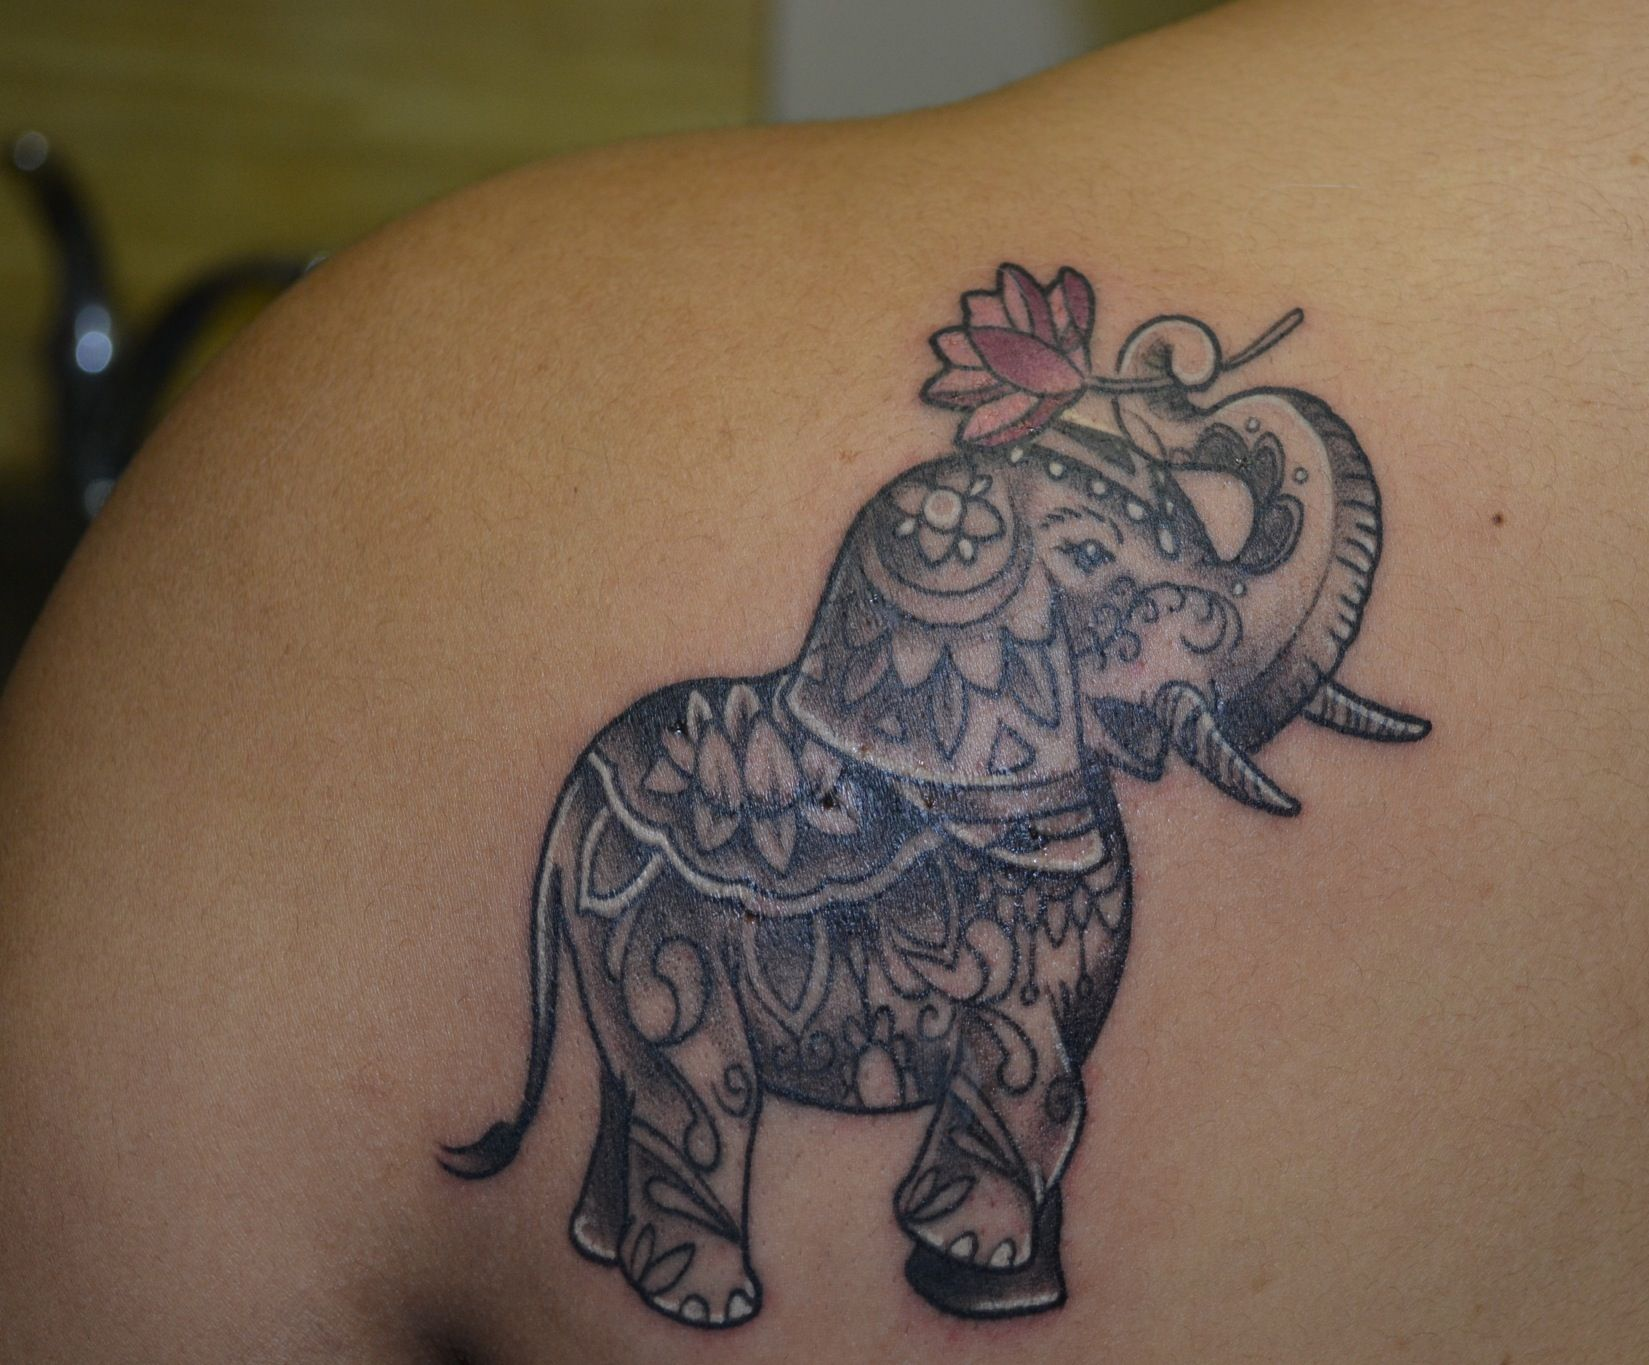 Elephant Tattoo 22 Elephant Tattoo Design Tattoos Trendy Tattoos